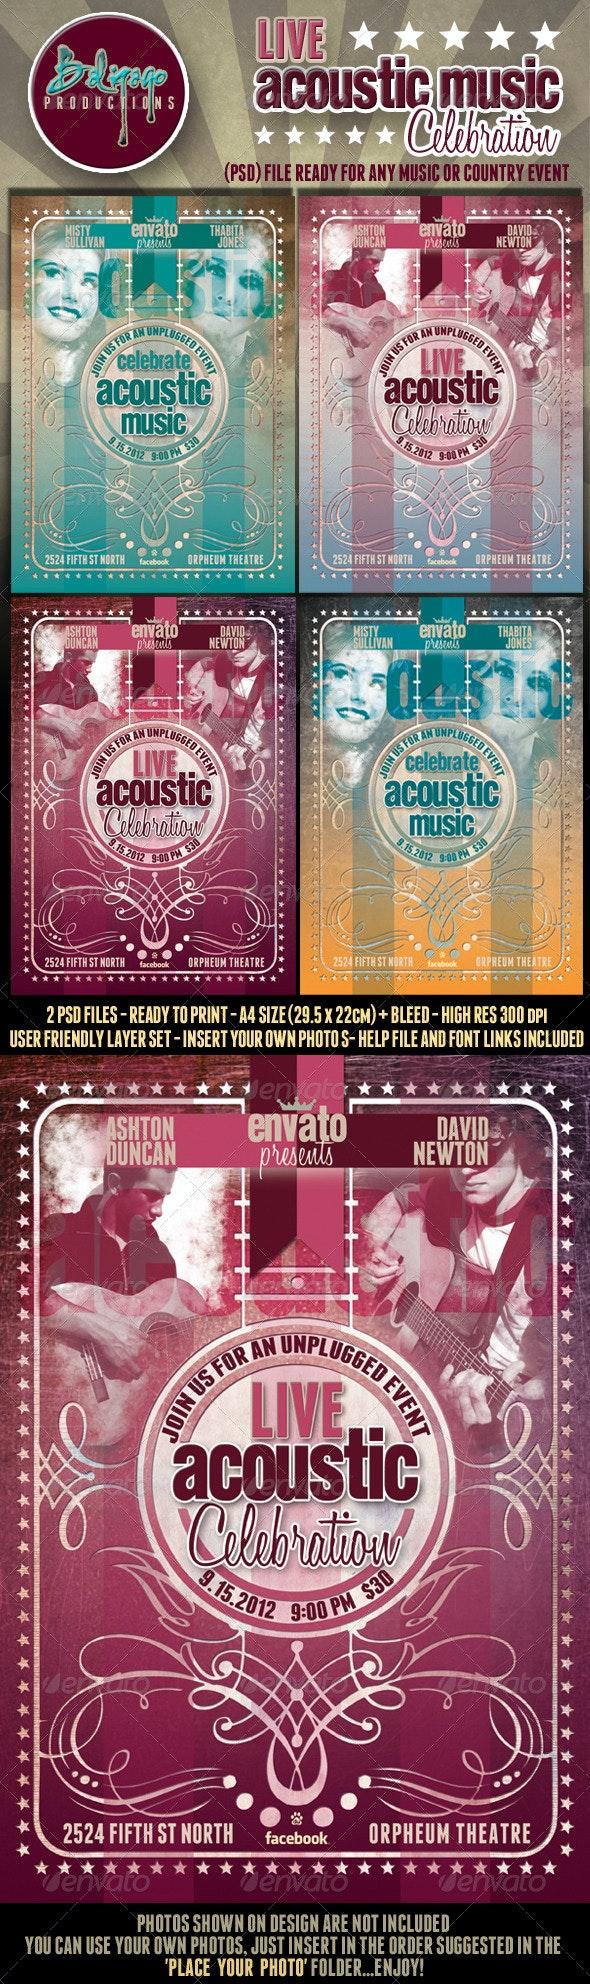 Live Acoustic Music Celebration Flyer Poster - Concerts Events